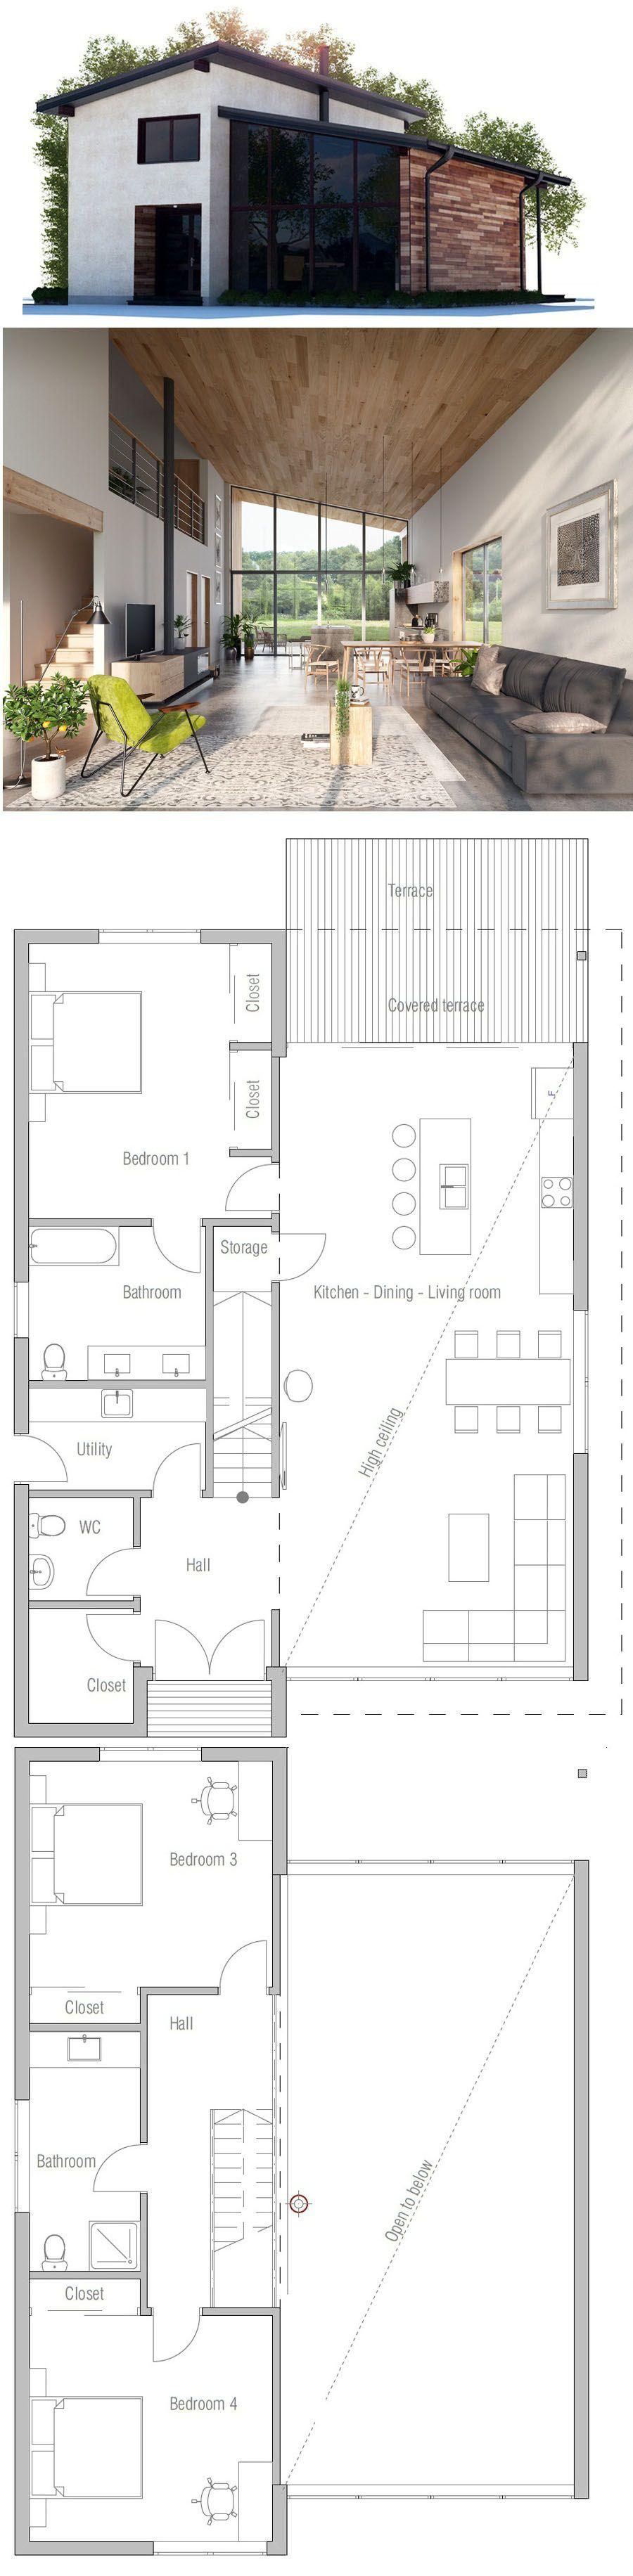 hermosos planos de planta abiertos House Plan Arquitectura En 2018 Casas Casas Modernas Y